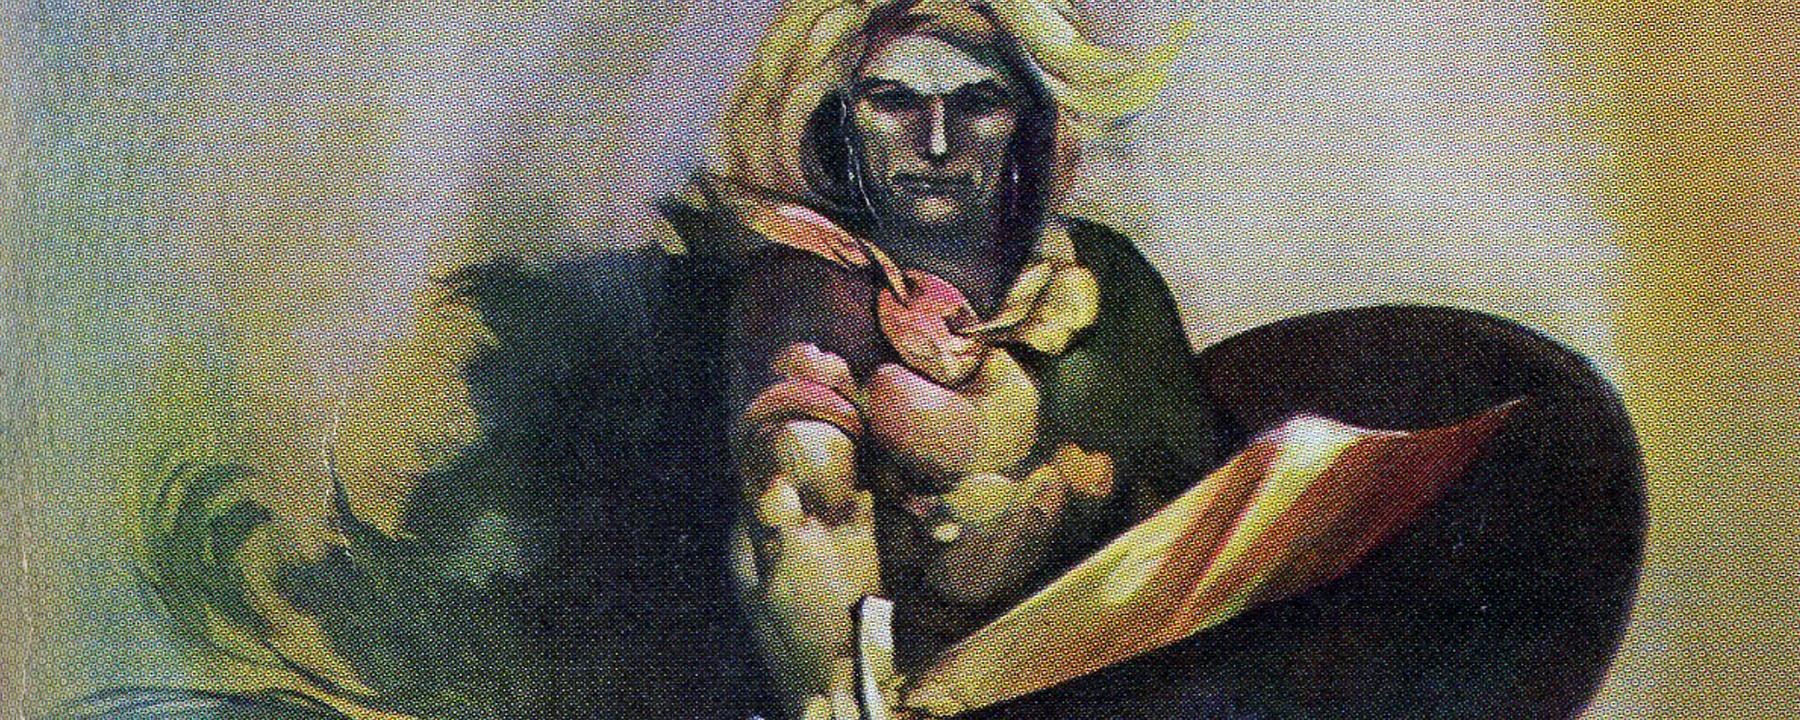 gardner f fox ebook paperback novel kurt brugel kindle gardner francis fox men's adventure library sword and sorcery